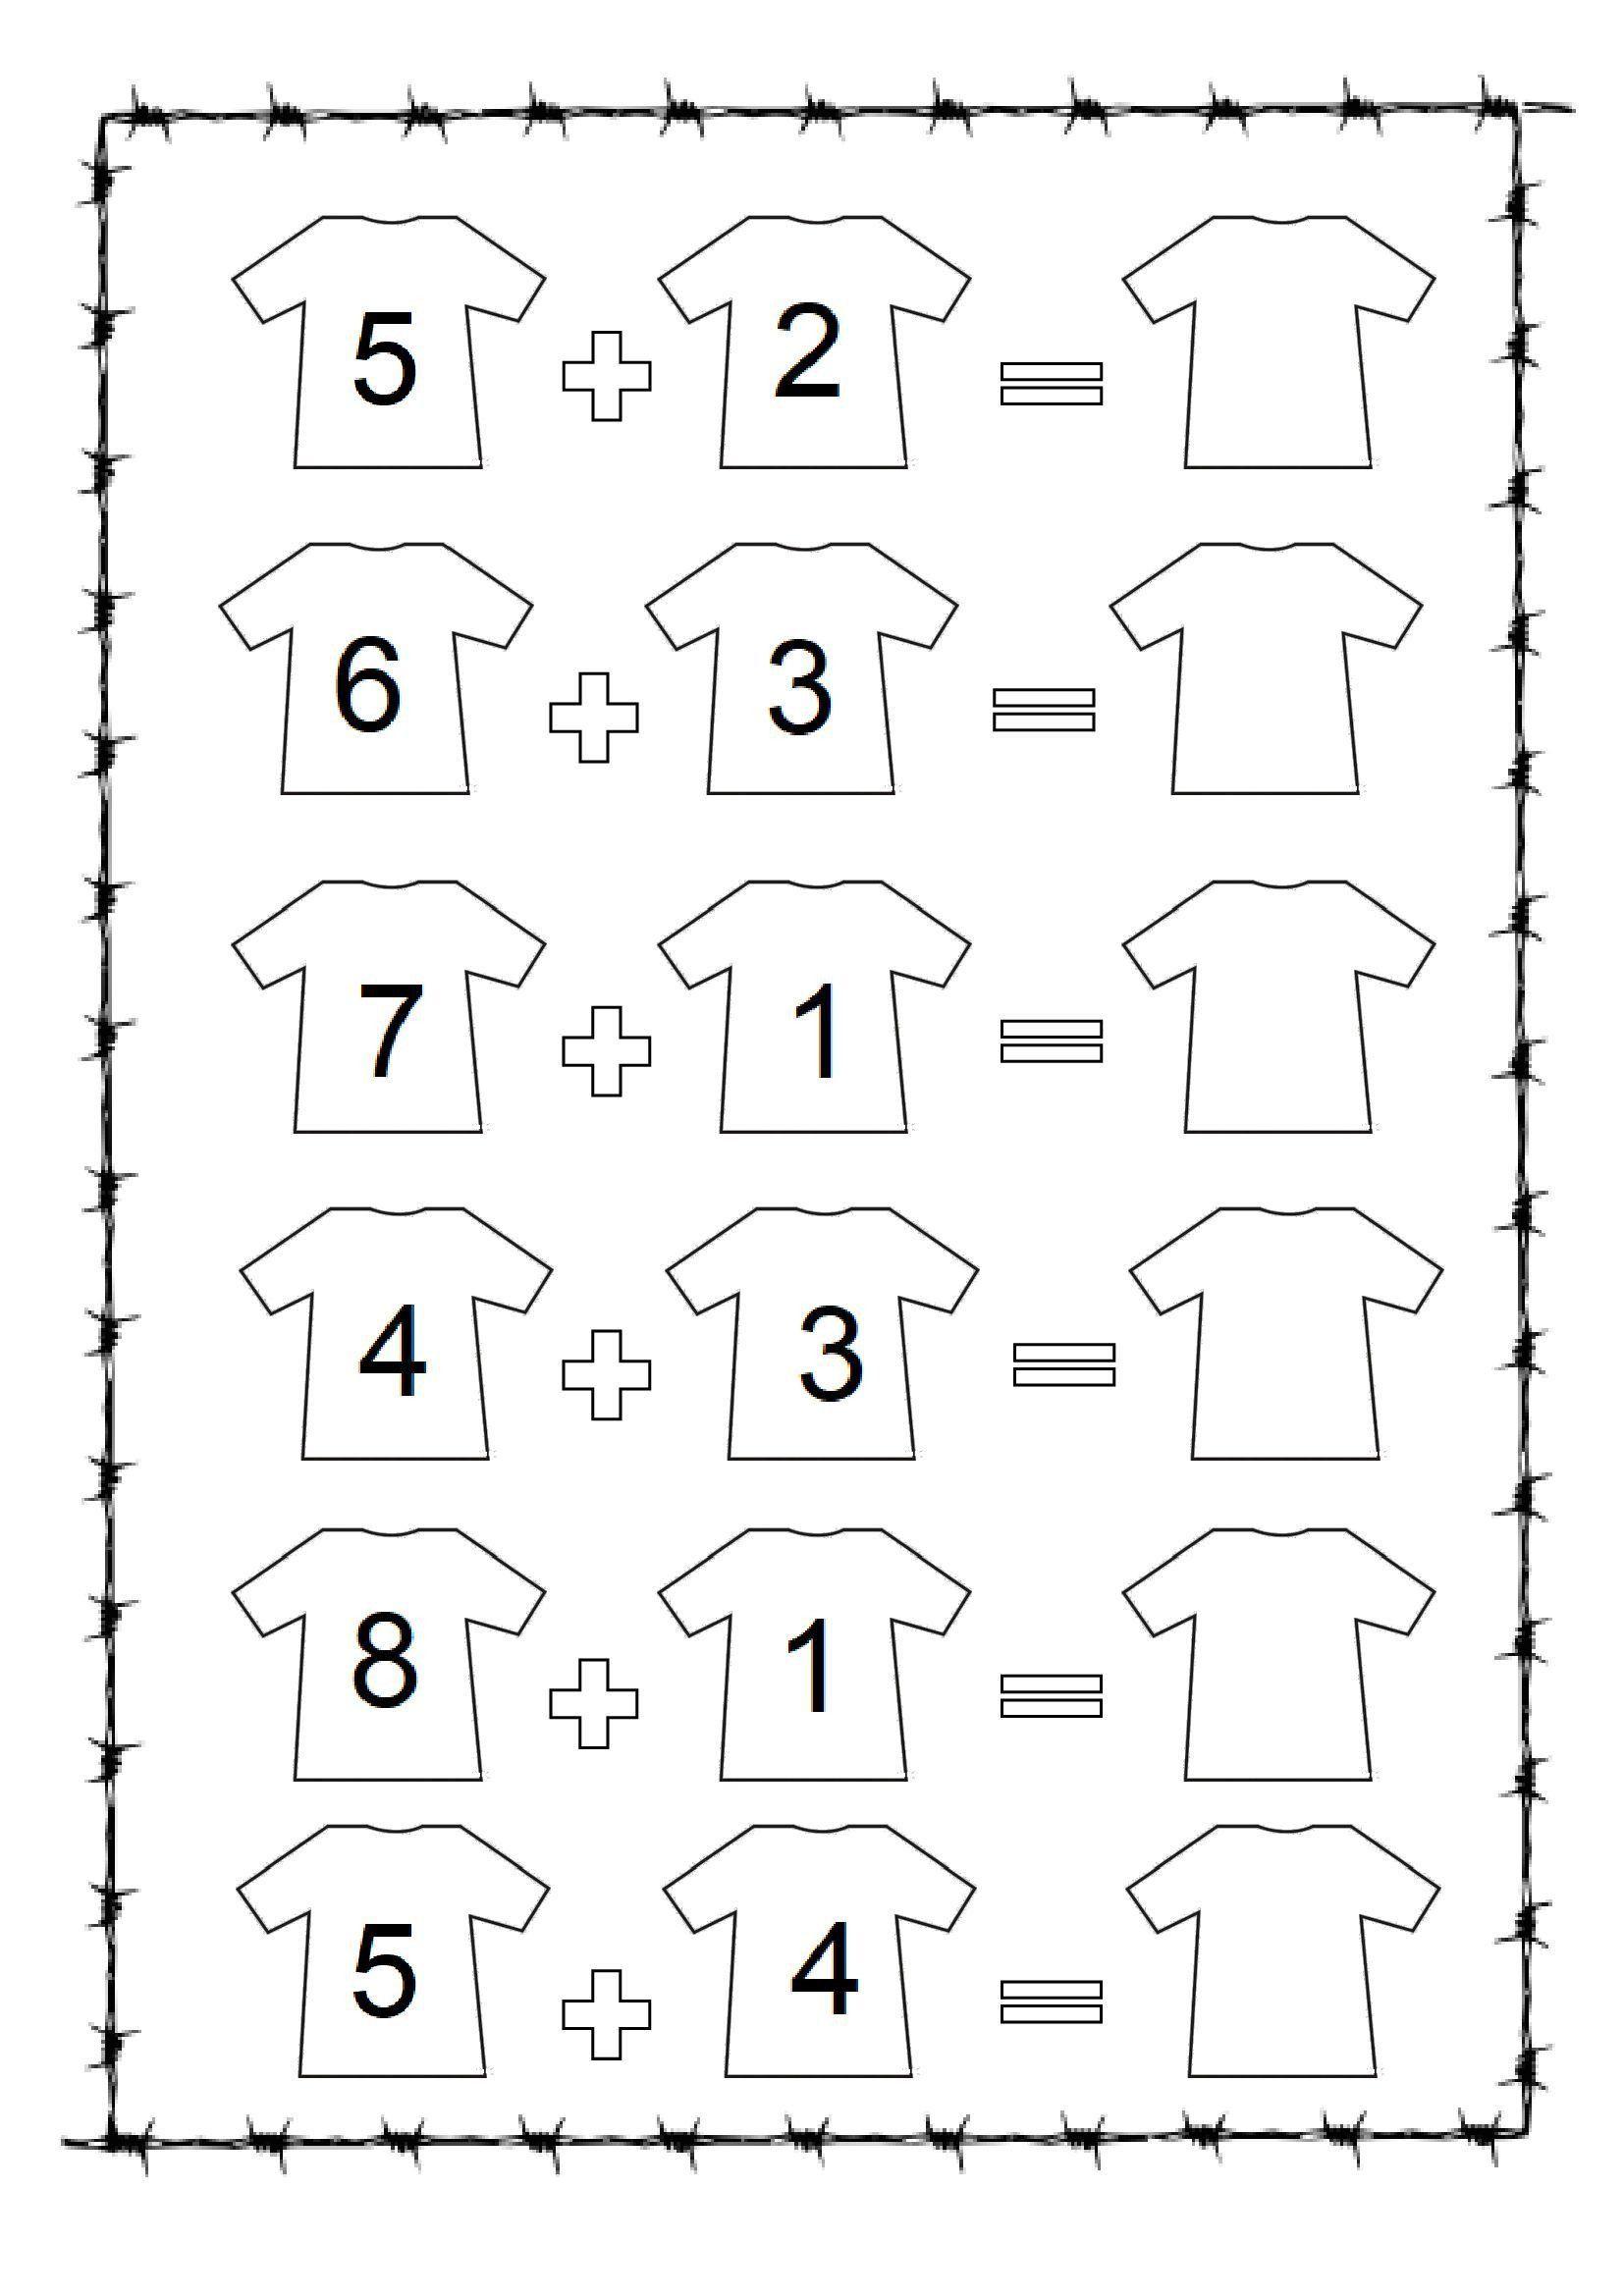 Preschool Math Worksheets Pdf Missing Number Workshe In 2020 Kindergarten Math Worksheets Kindergarten Math Worksheets Addition Math Activities Kindergarten Printables